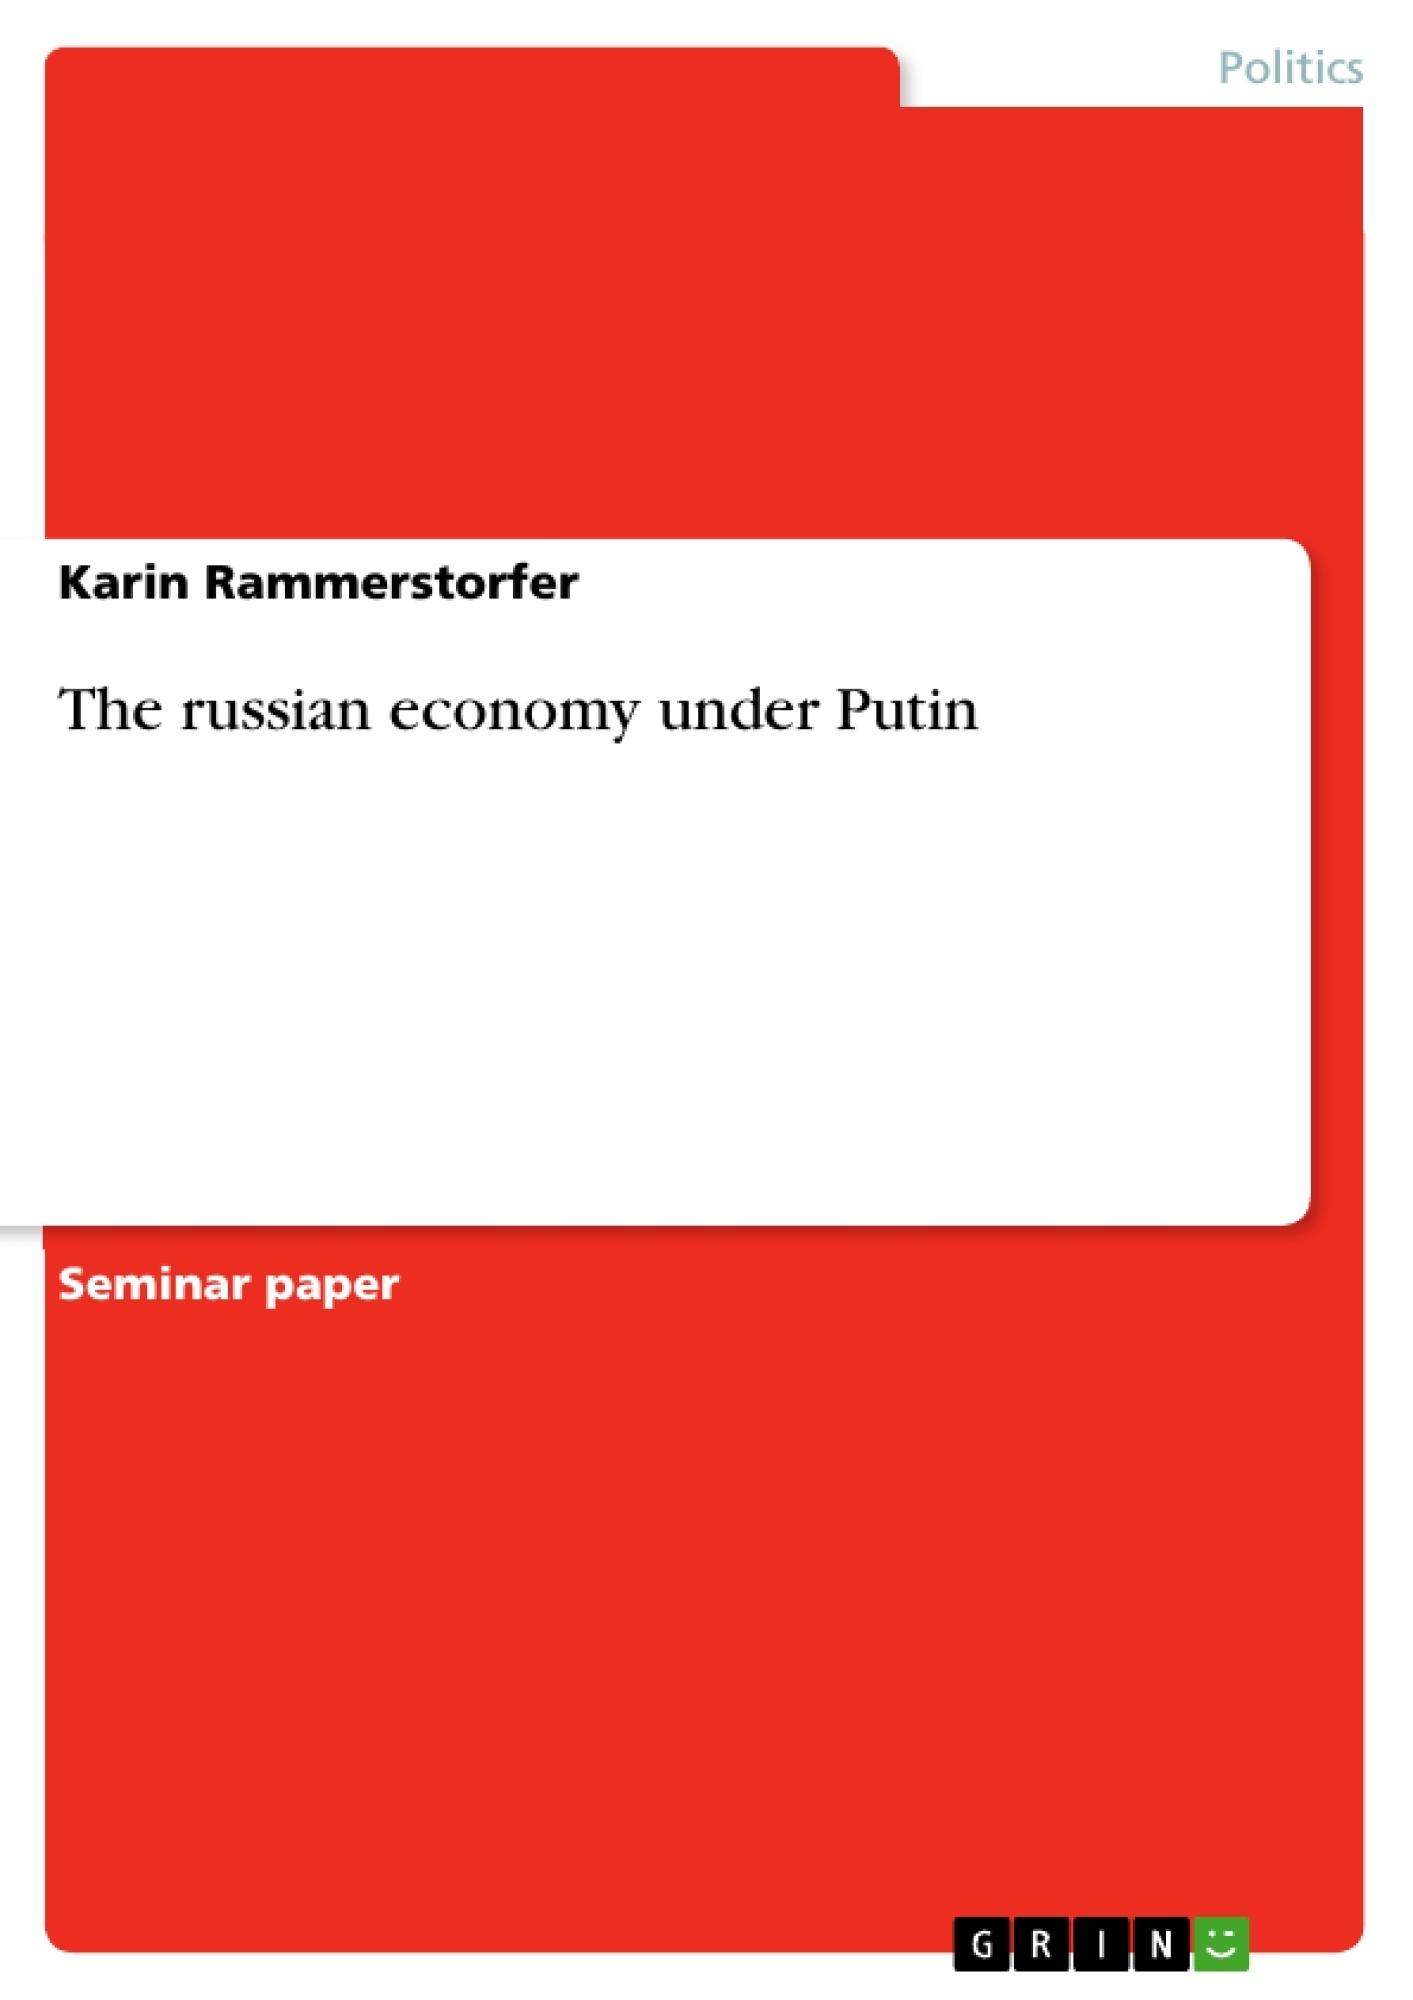 Title: The russian economy under Putin